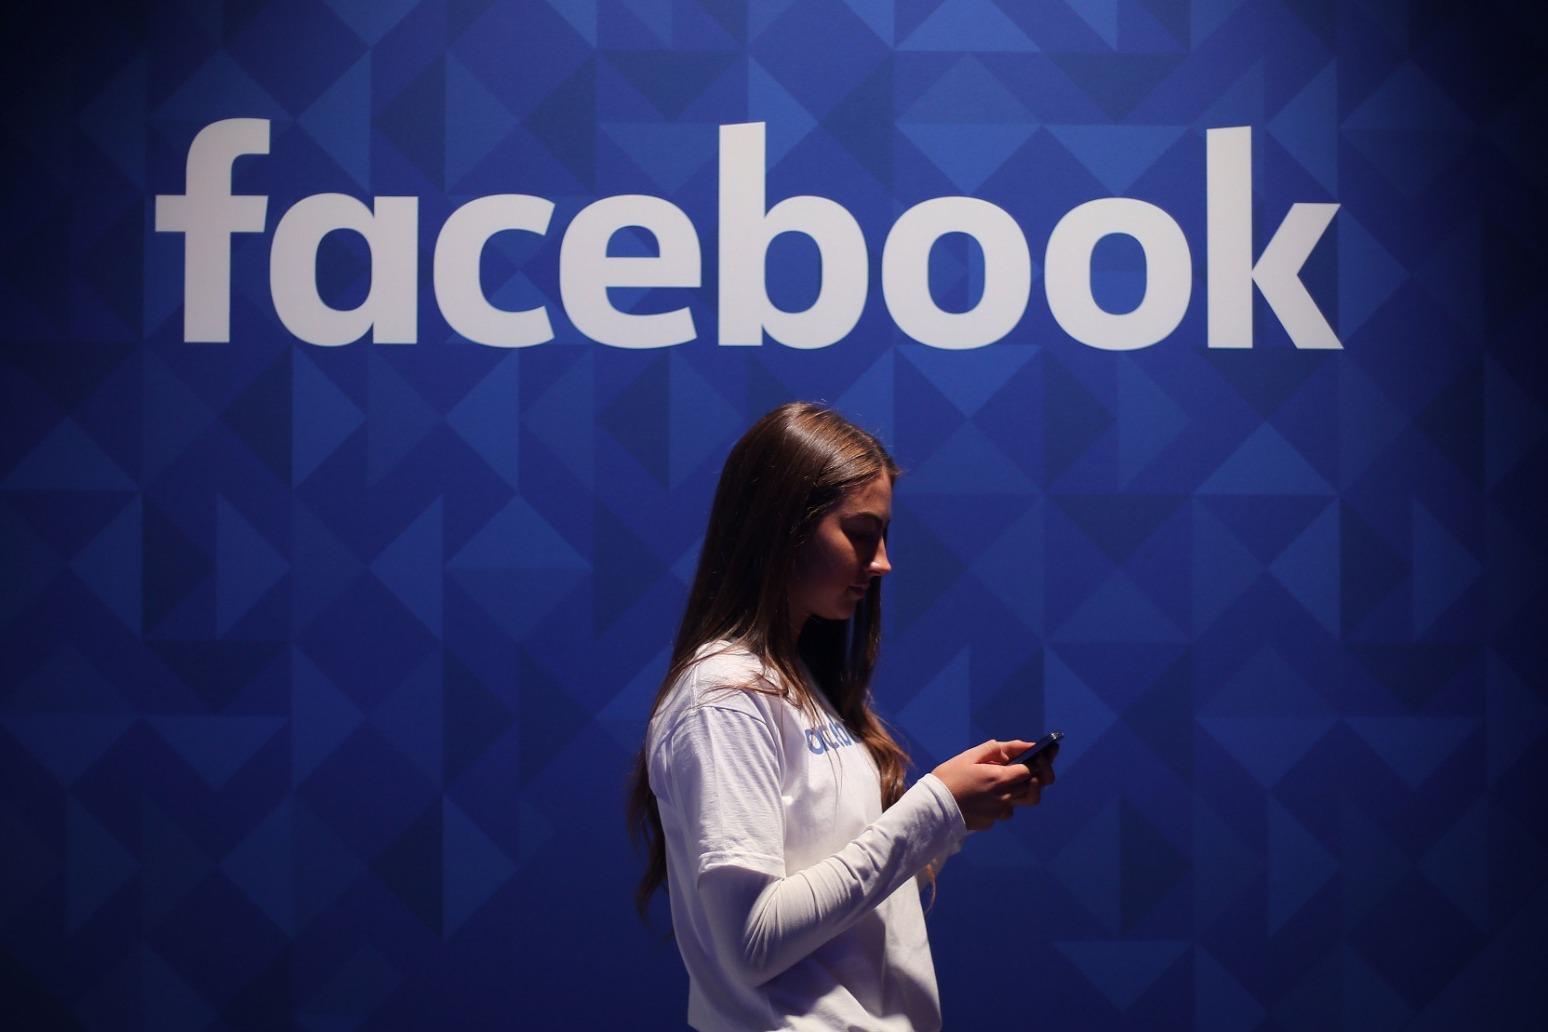 Report: Hate speech prevalence on Facebook declining